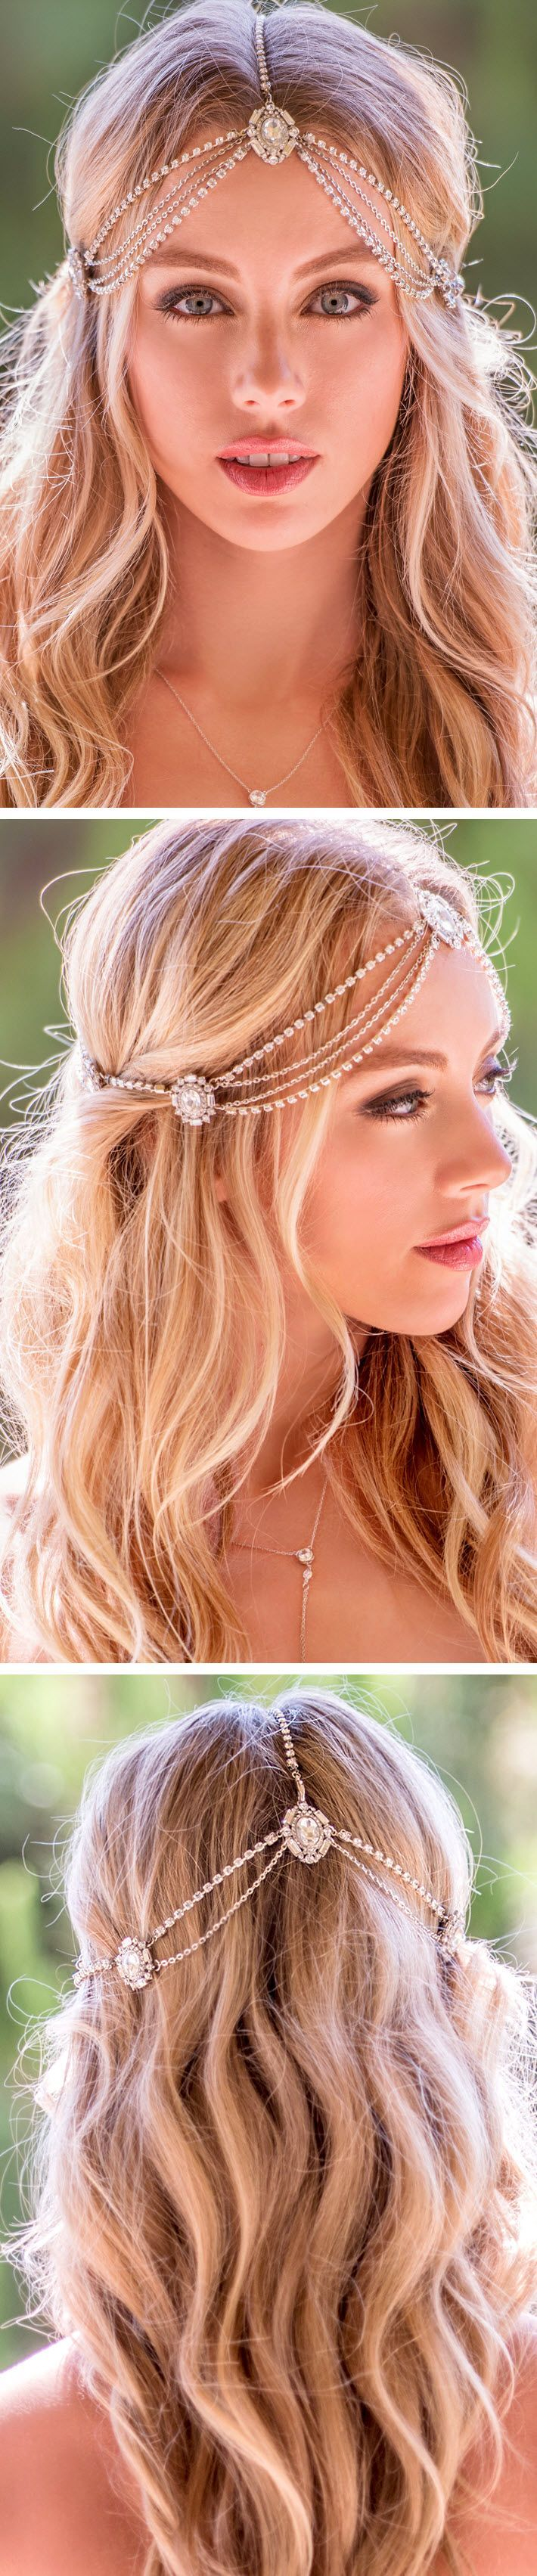 Silver Crystal Headpiece, Bridal Crystal Headpiece, Silver Bridal Headpiece, Wedding Head Jewelry, Silver Wedding Jewelry, Crystal Bridal Jewelry